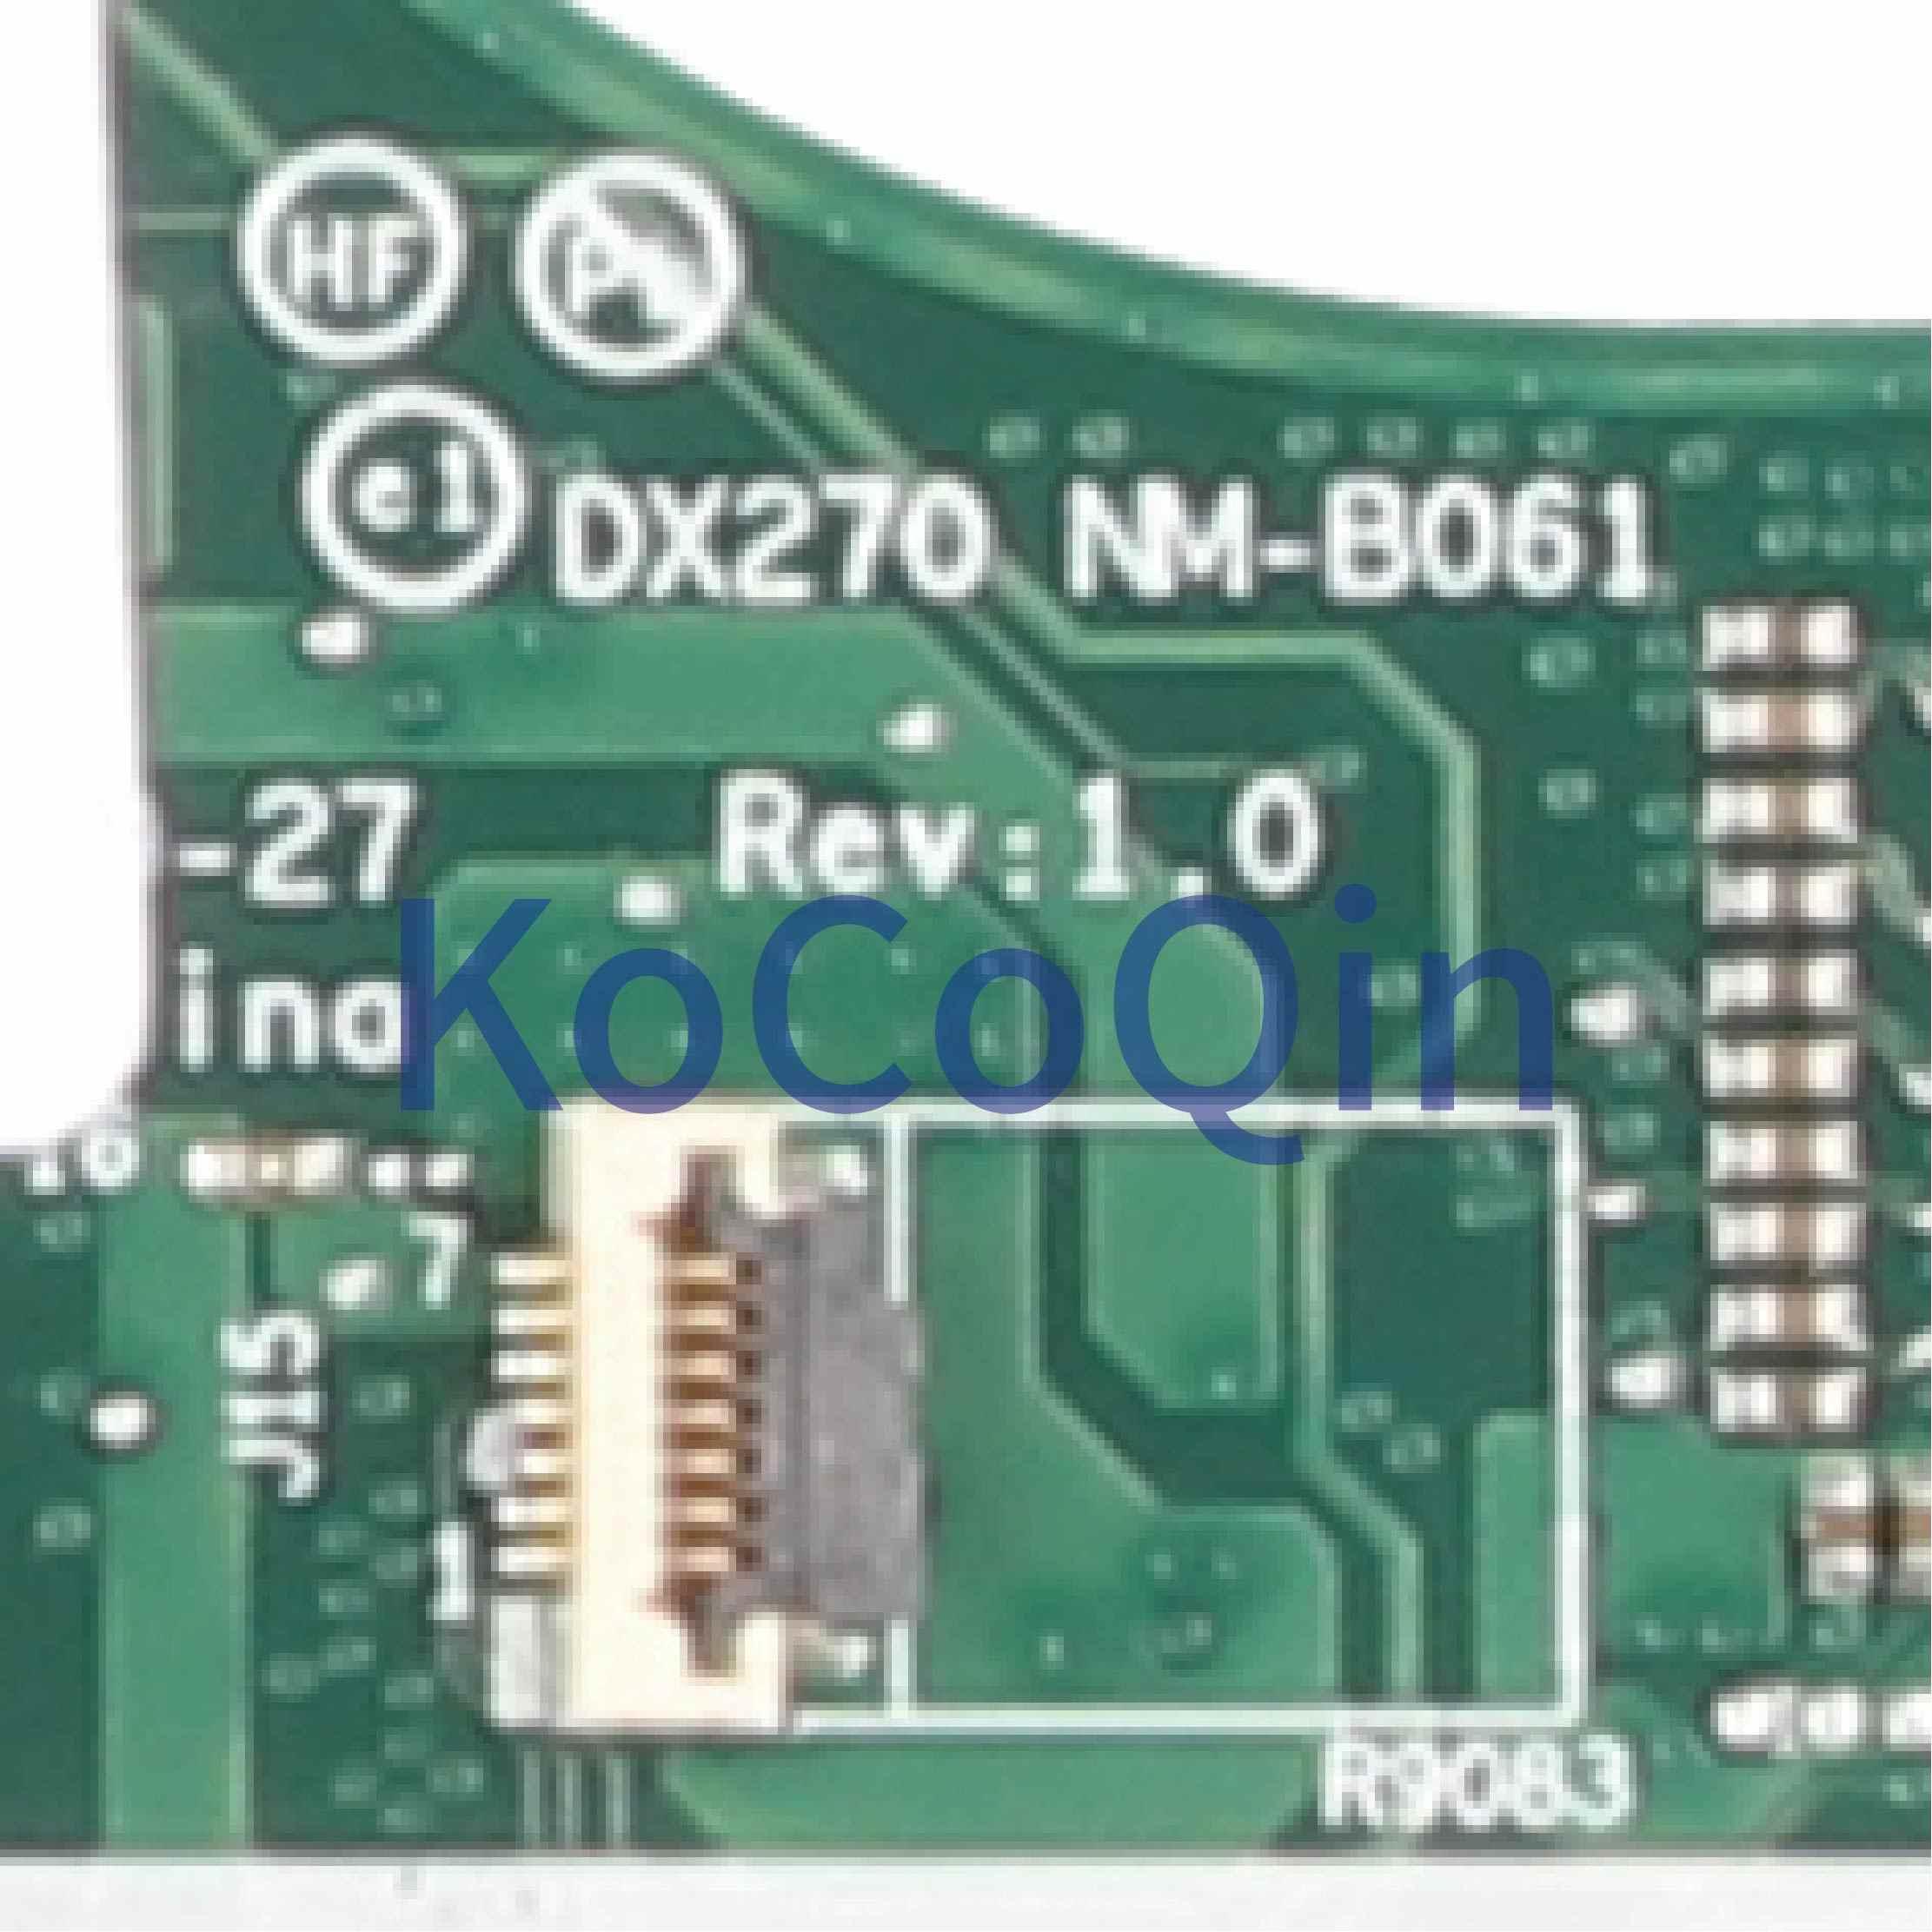 KoCoQin اللوحة الأم لأجهزة الكمبيوتر المحمول لينوفو ثينك باد X270 كور SR2EY i5-6200U 01LW725 01HY517 DX270 NM-B061